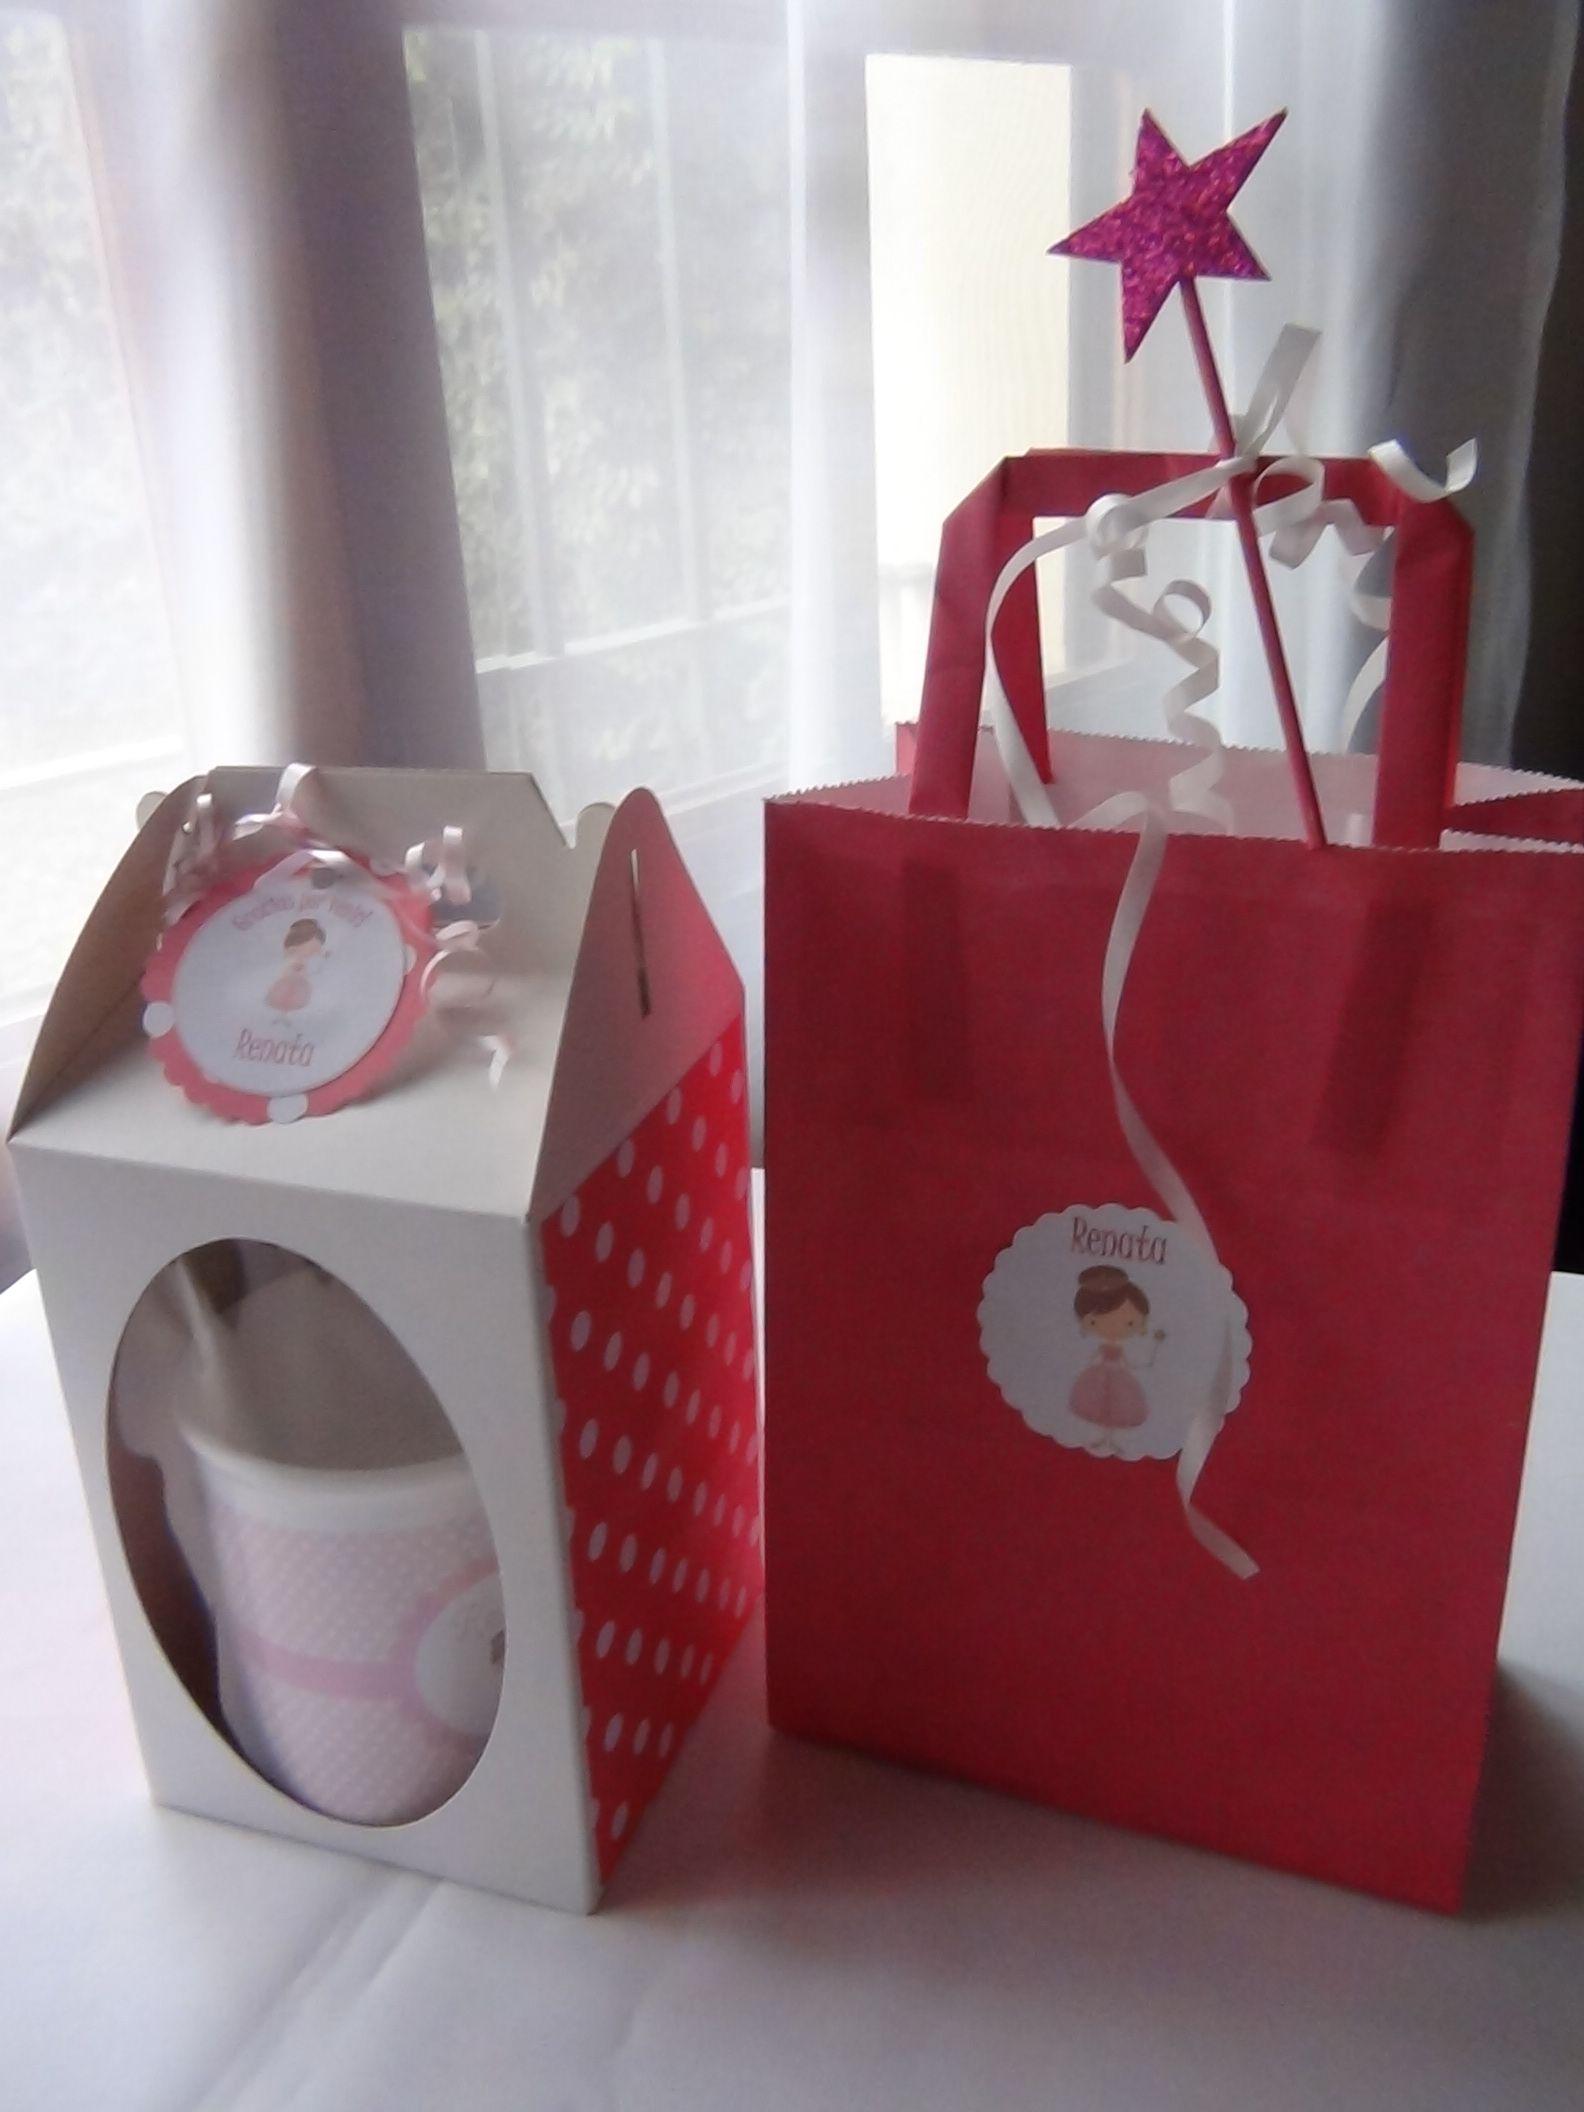 Souvenir taza de princesa en cajita decorada. Bolsita golosinera de princesa personalizada.